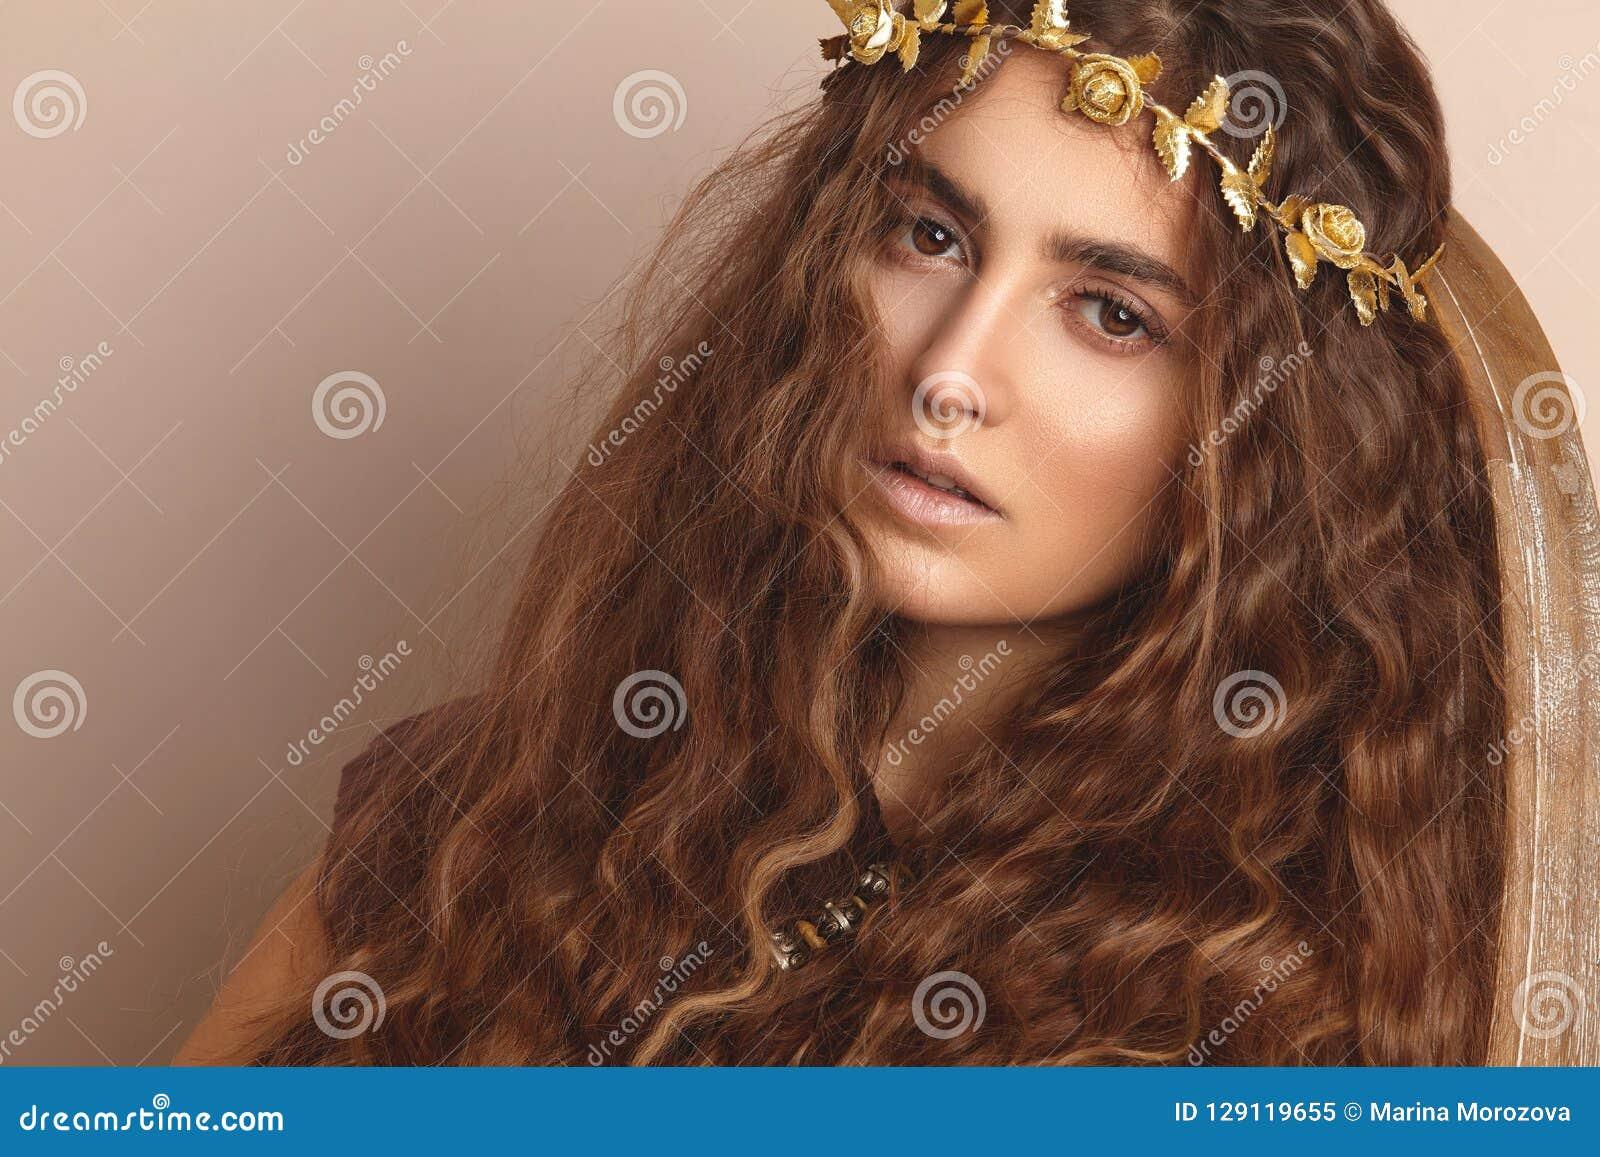 Mulher bonita Cabelo longo encaracolado Modelo de forma no vestido dourado Penteado ondulado saudável acessórios Autumn Wreath, c